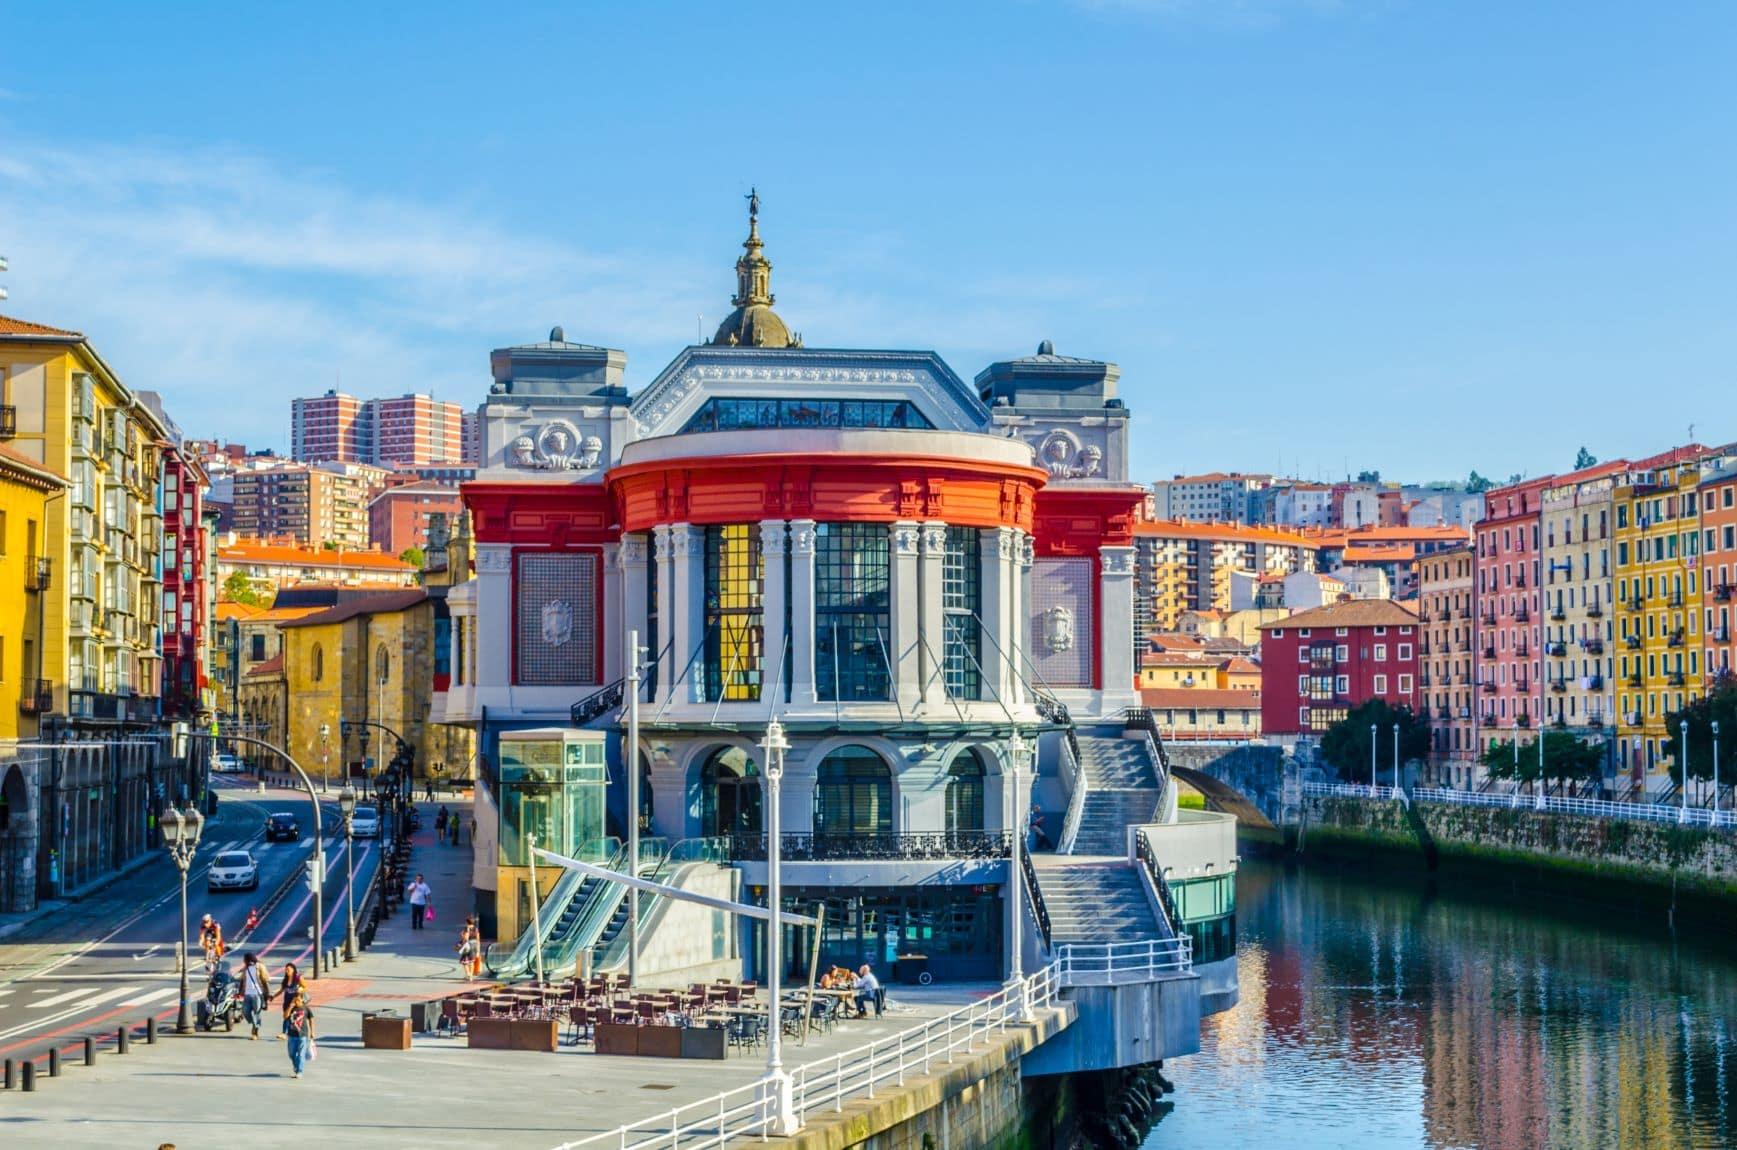 Mercado de La Ribera in Bilbao